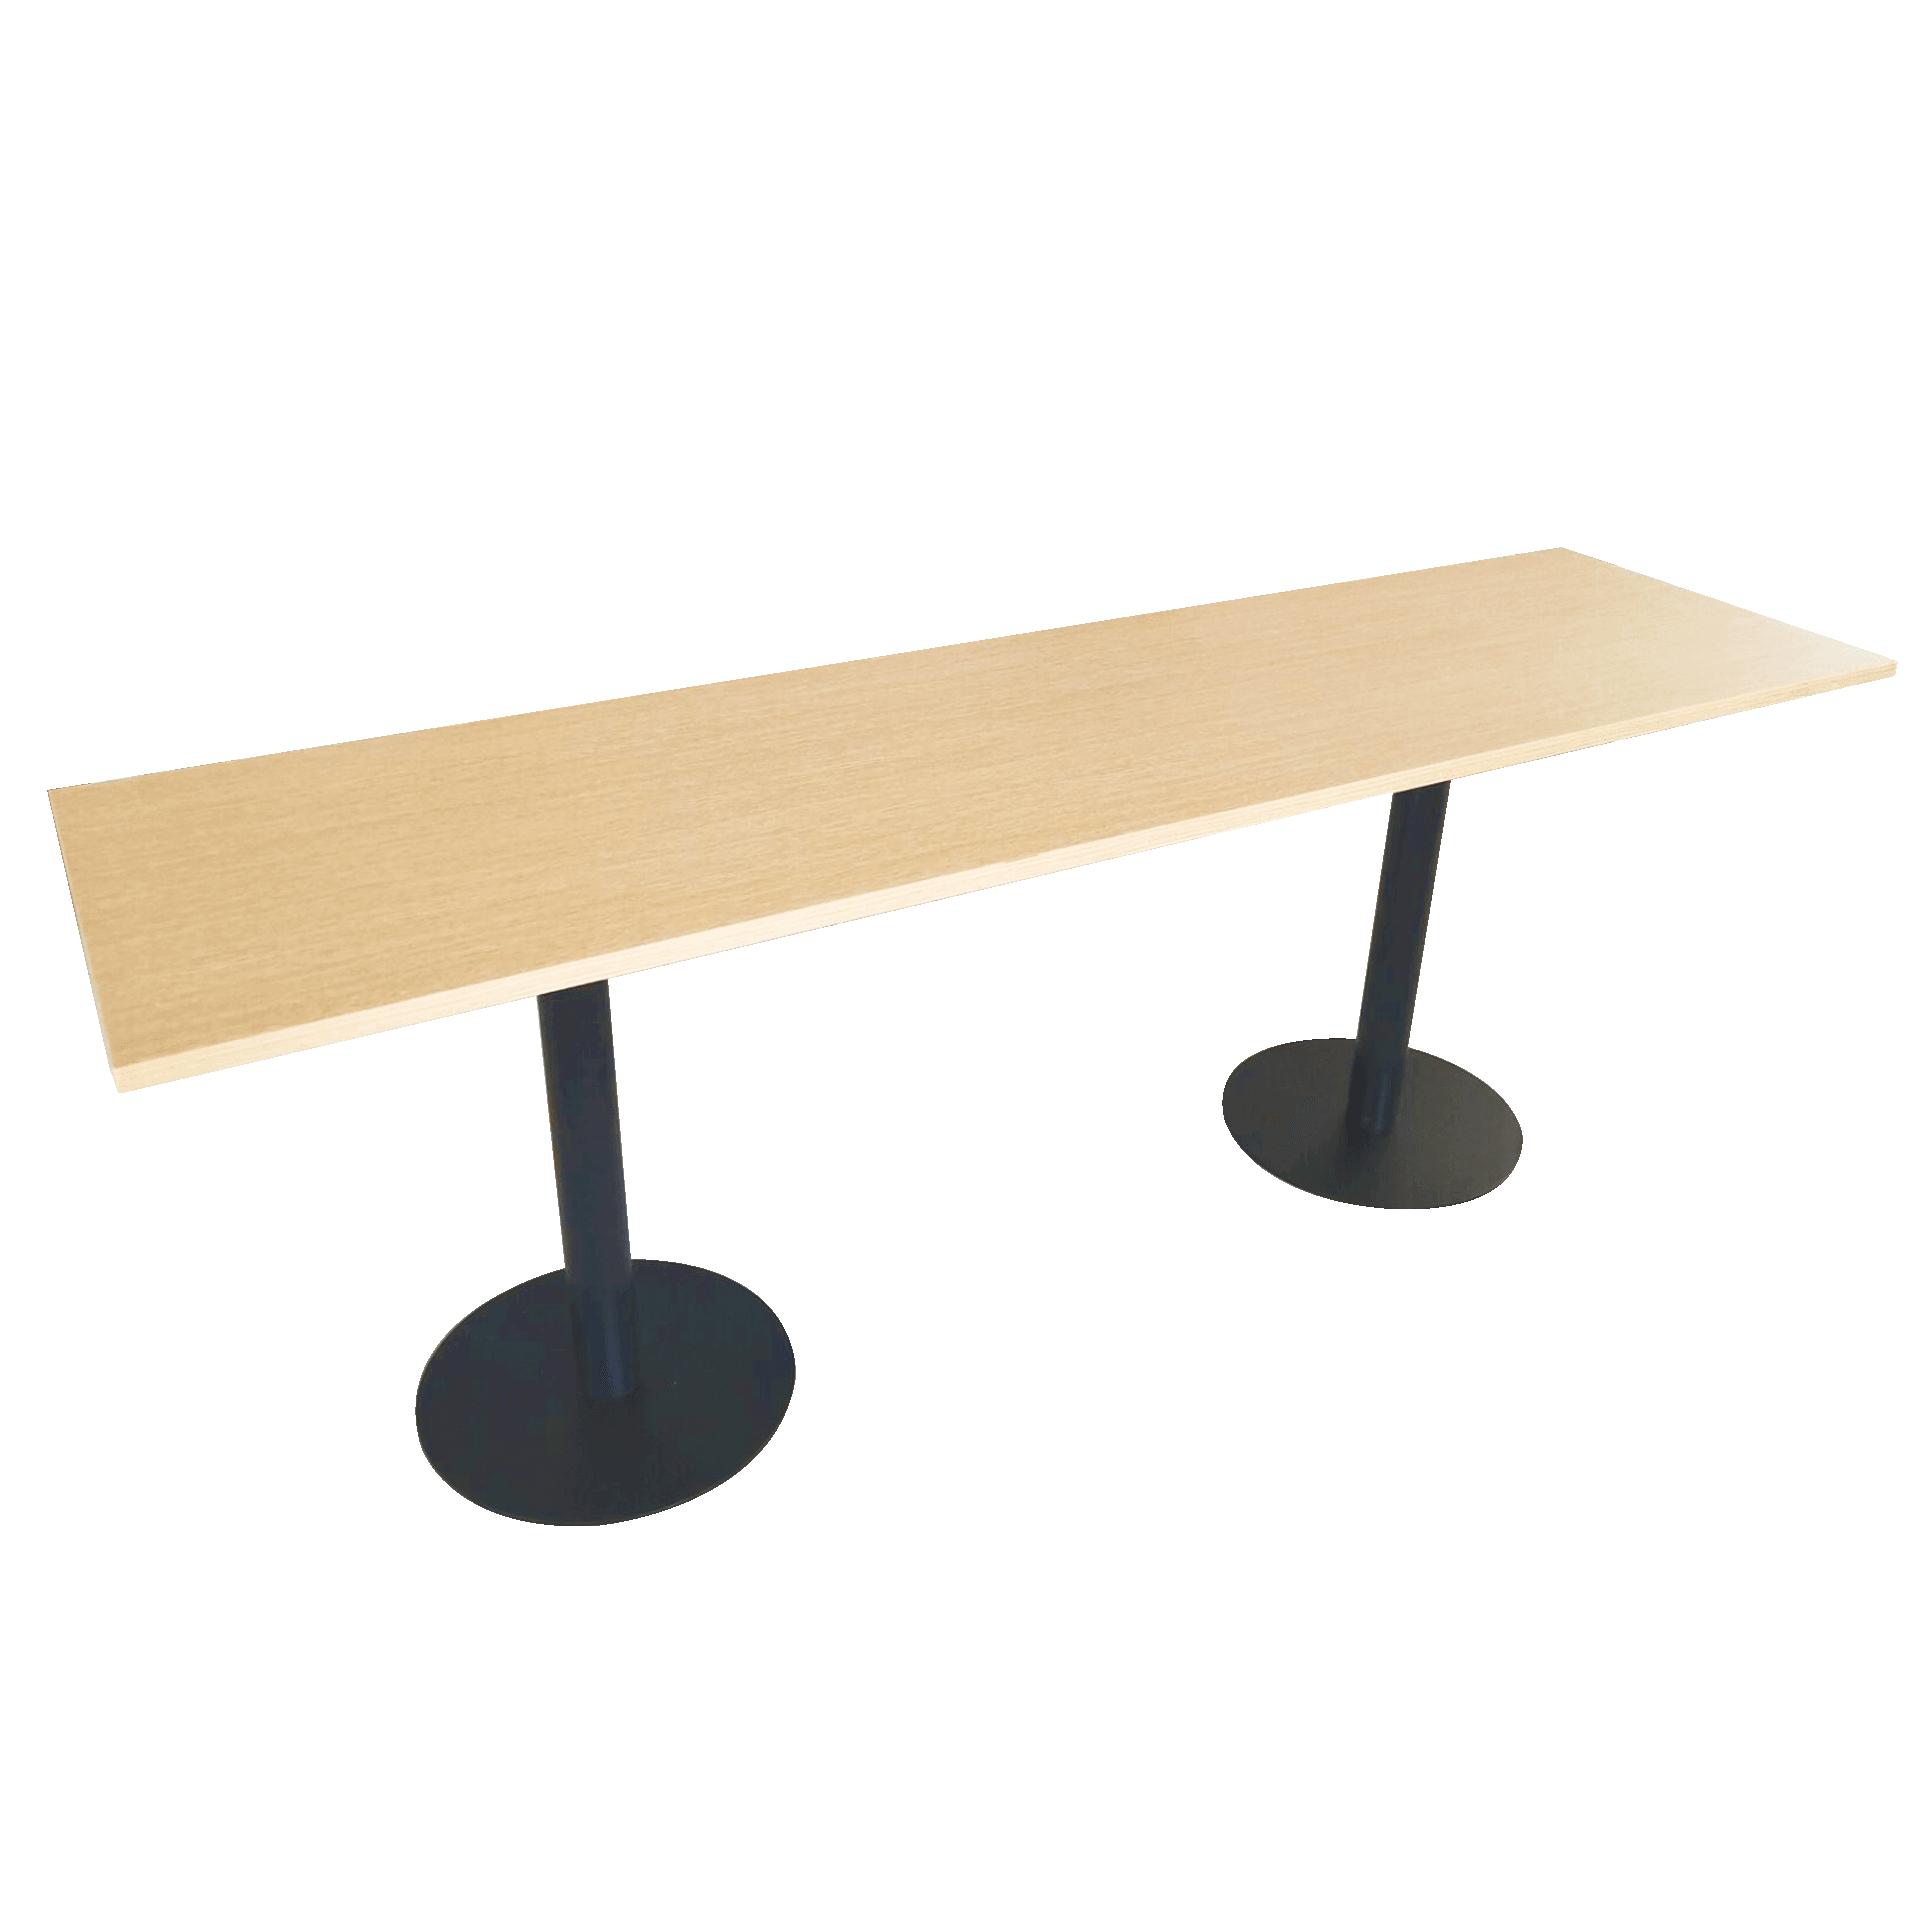 Restaurant Bar Table 2 Legs Height Adjule Design For High End Material